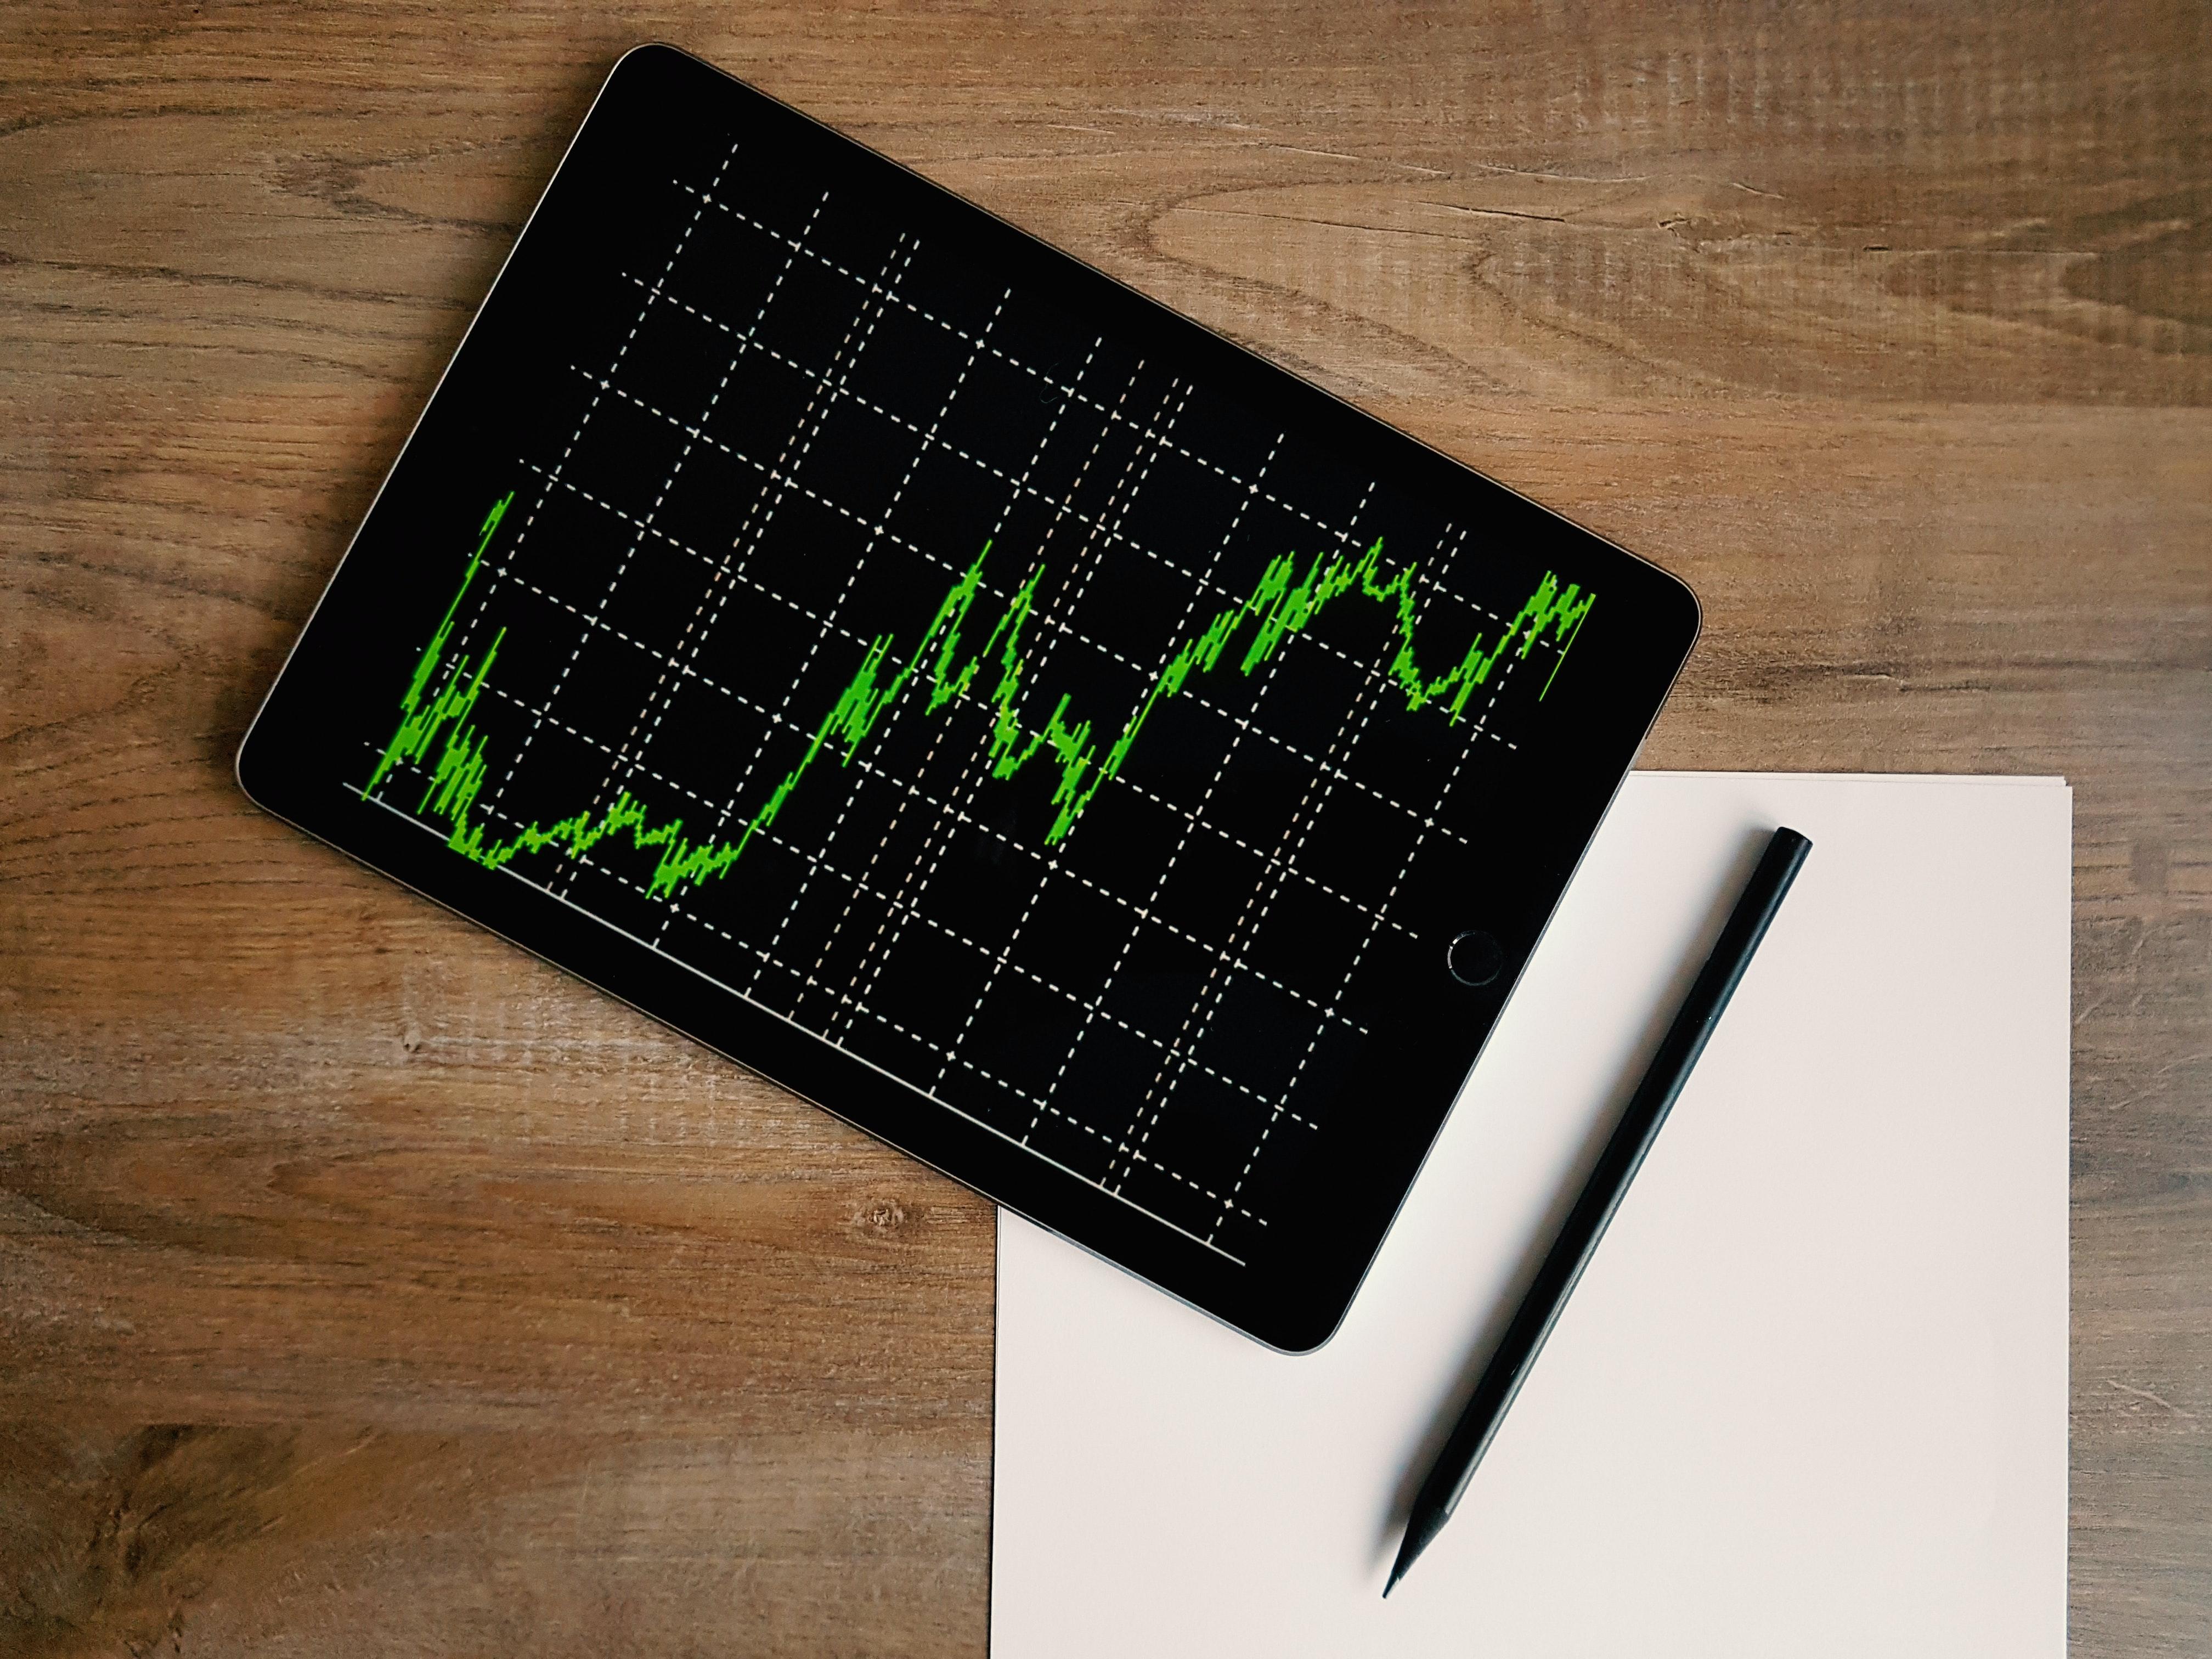 iPad showing a chart.